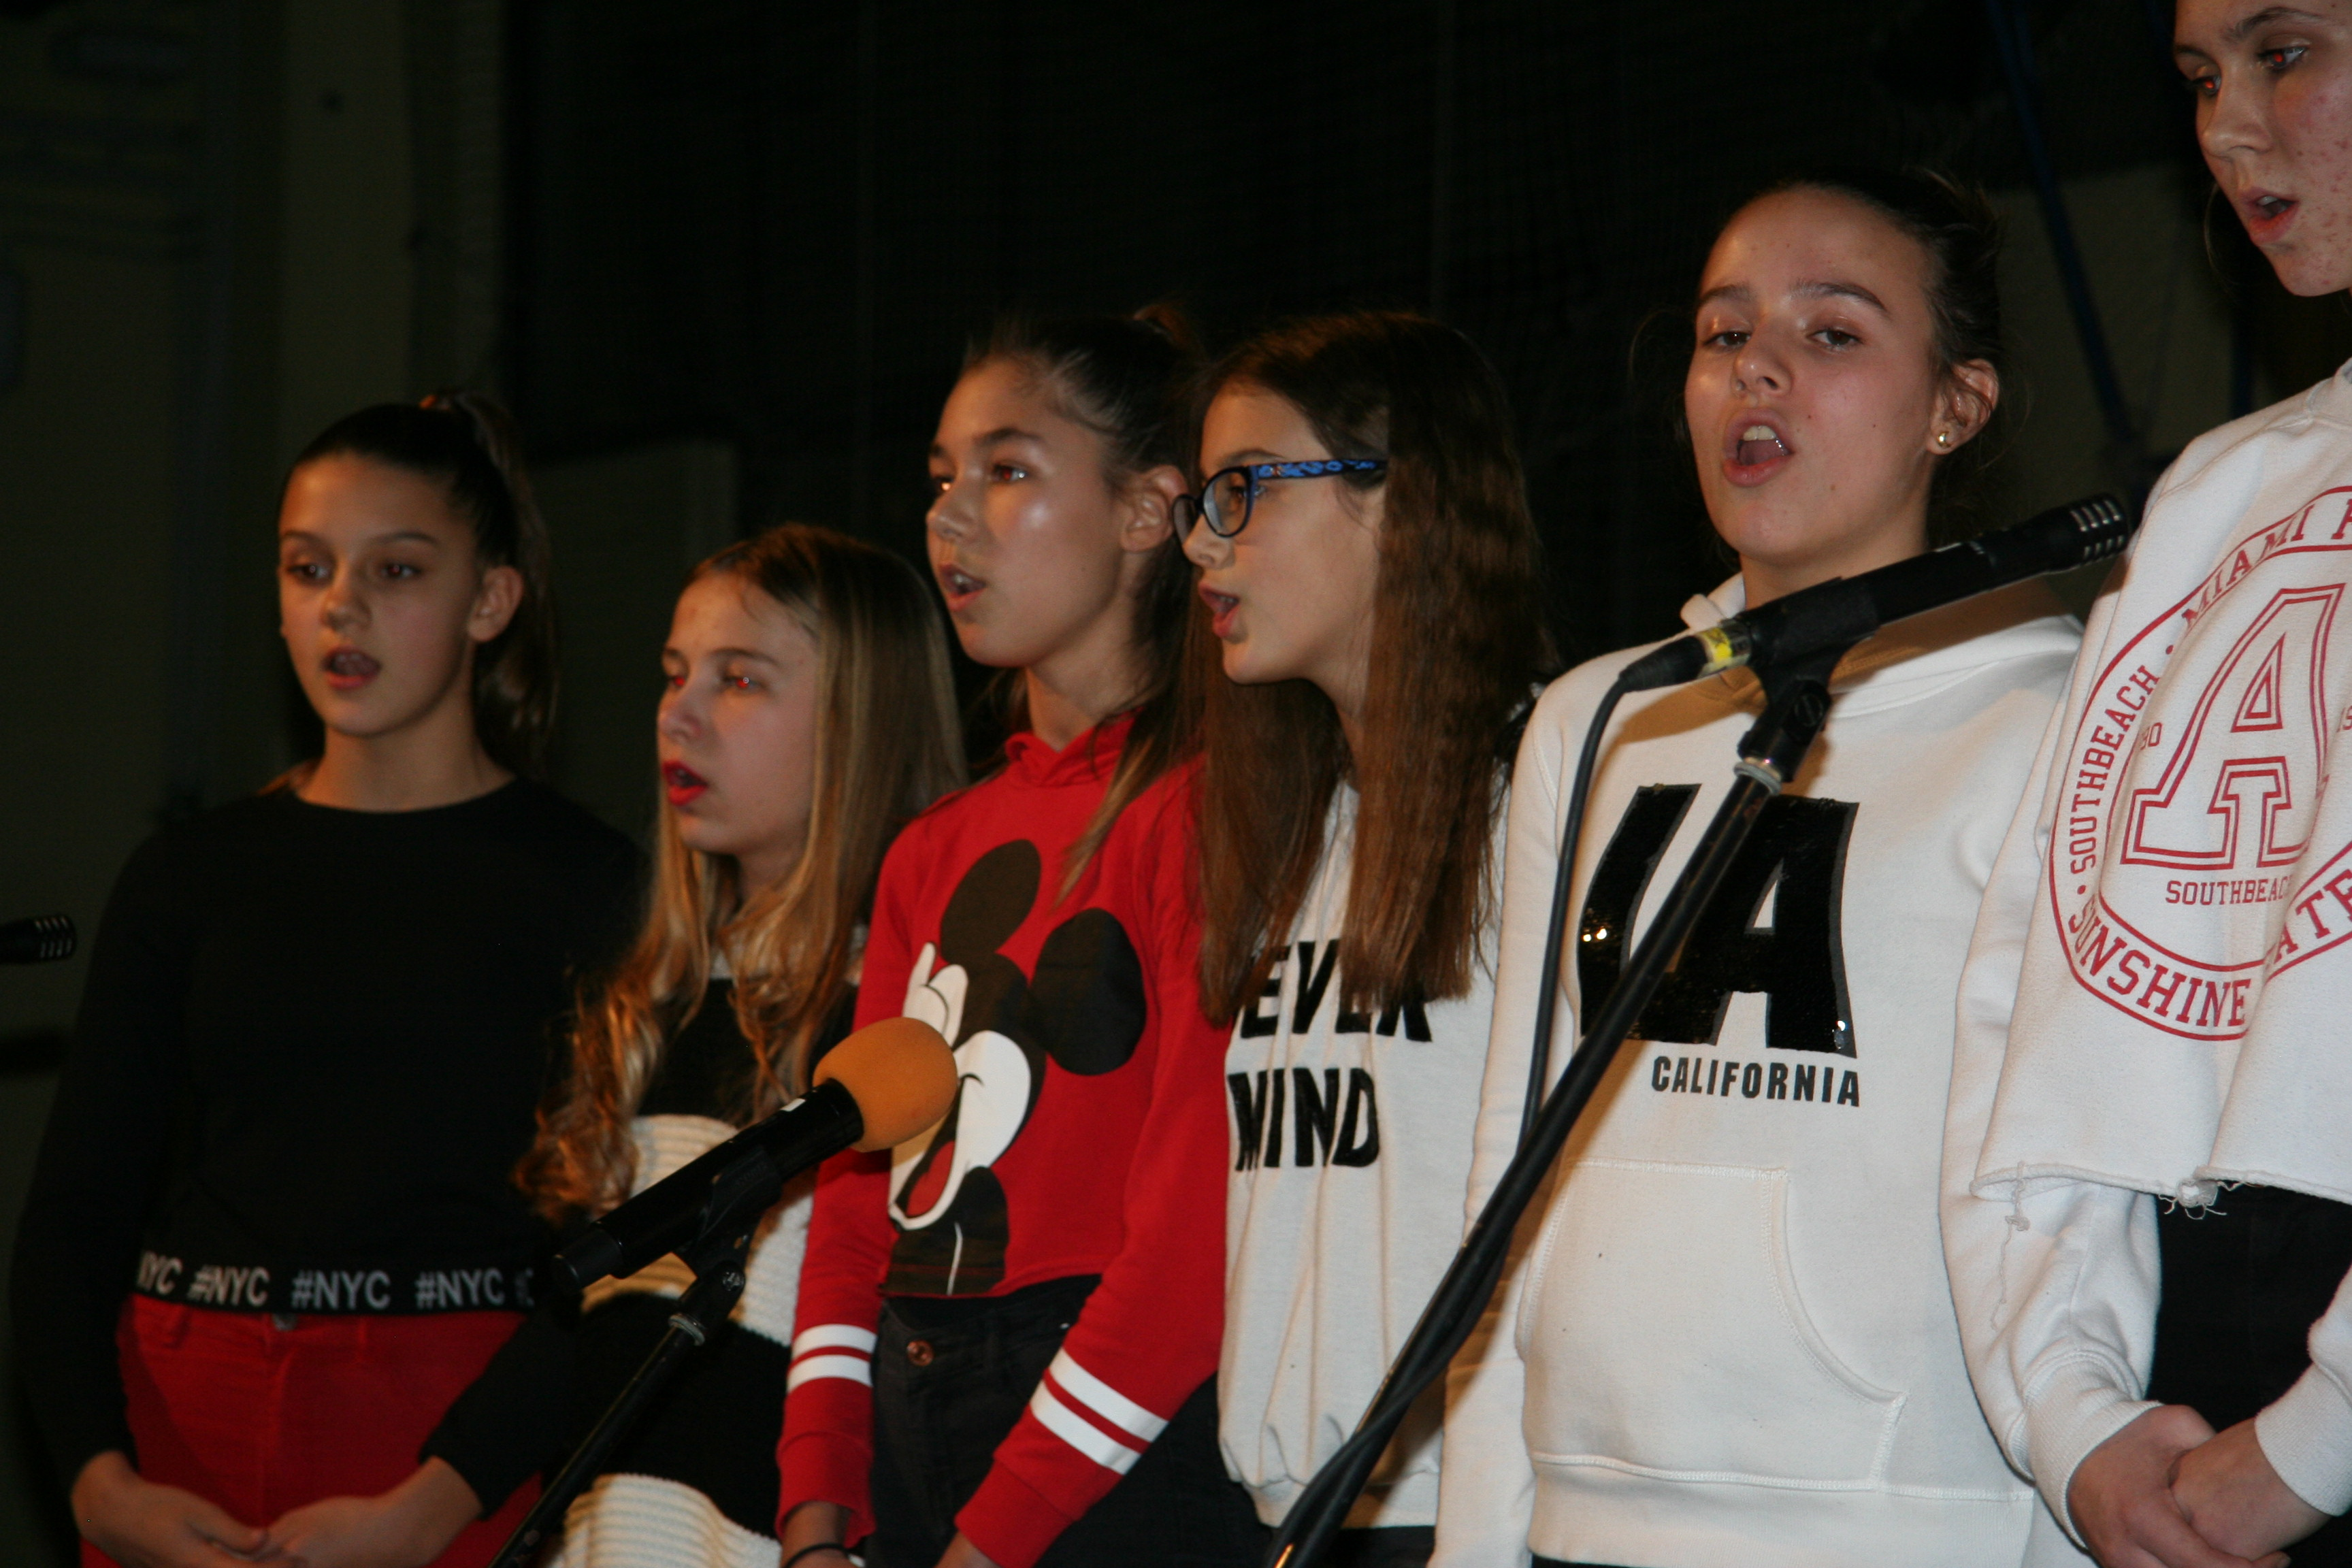 novoletno_humanitarni-koncert-2019-140